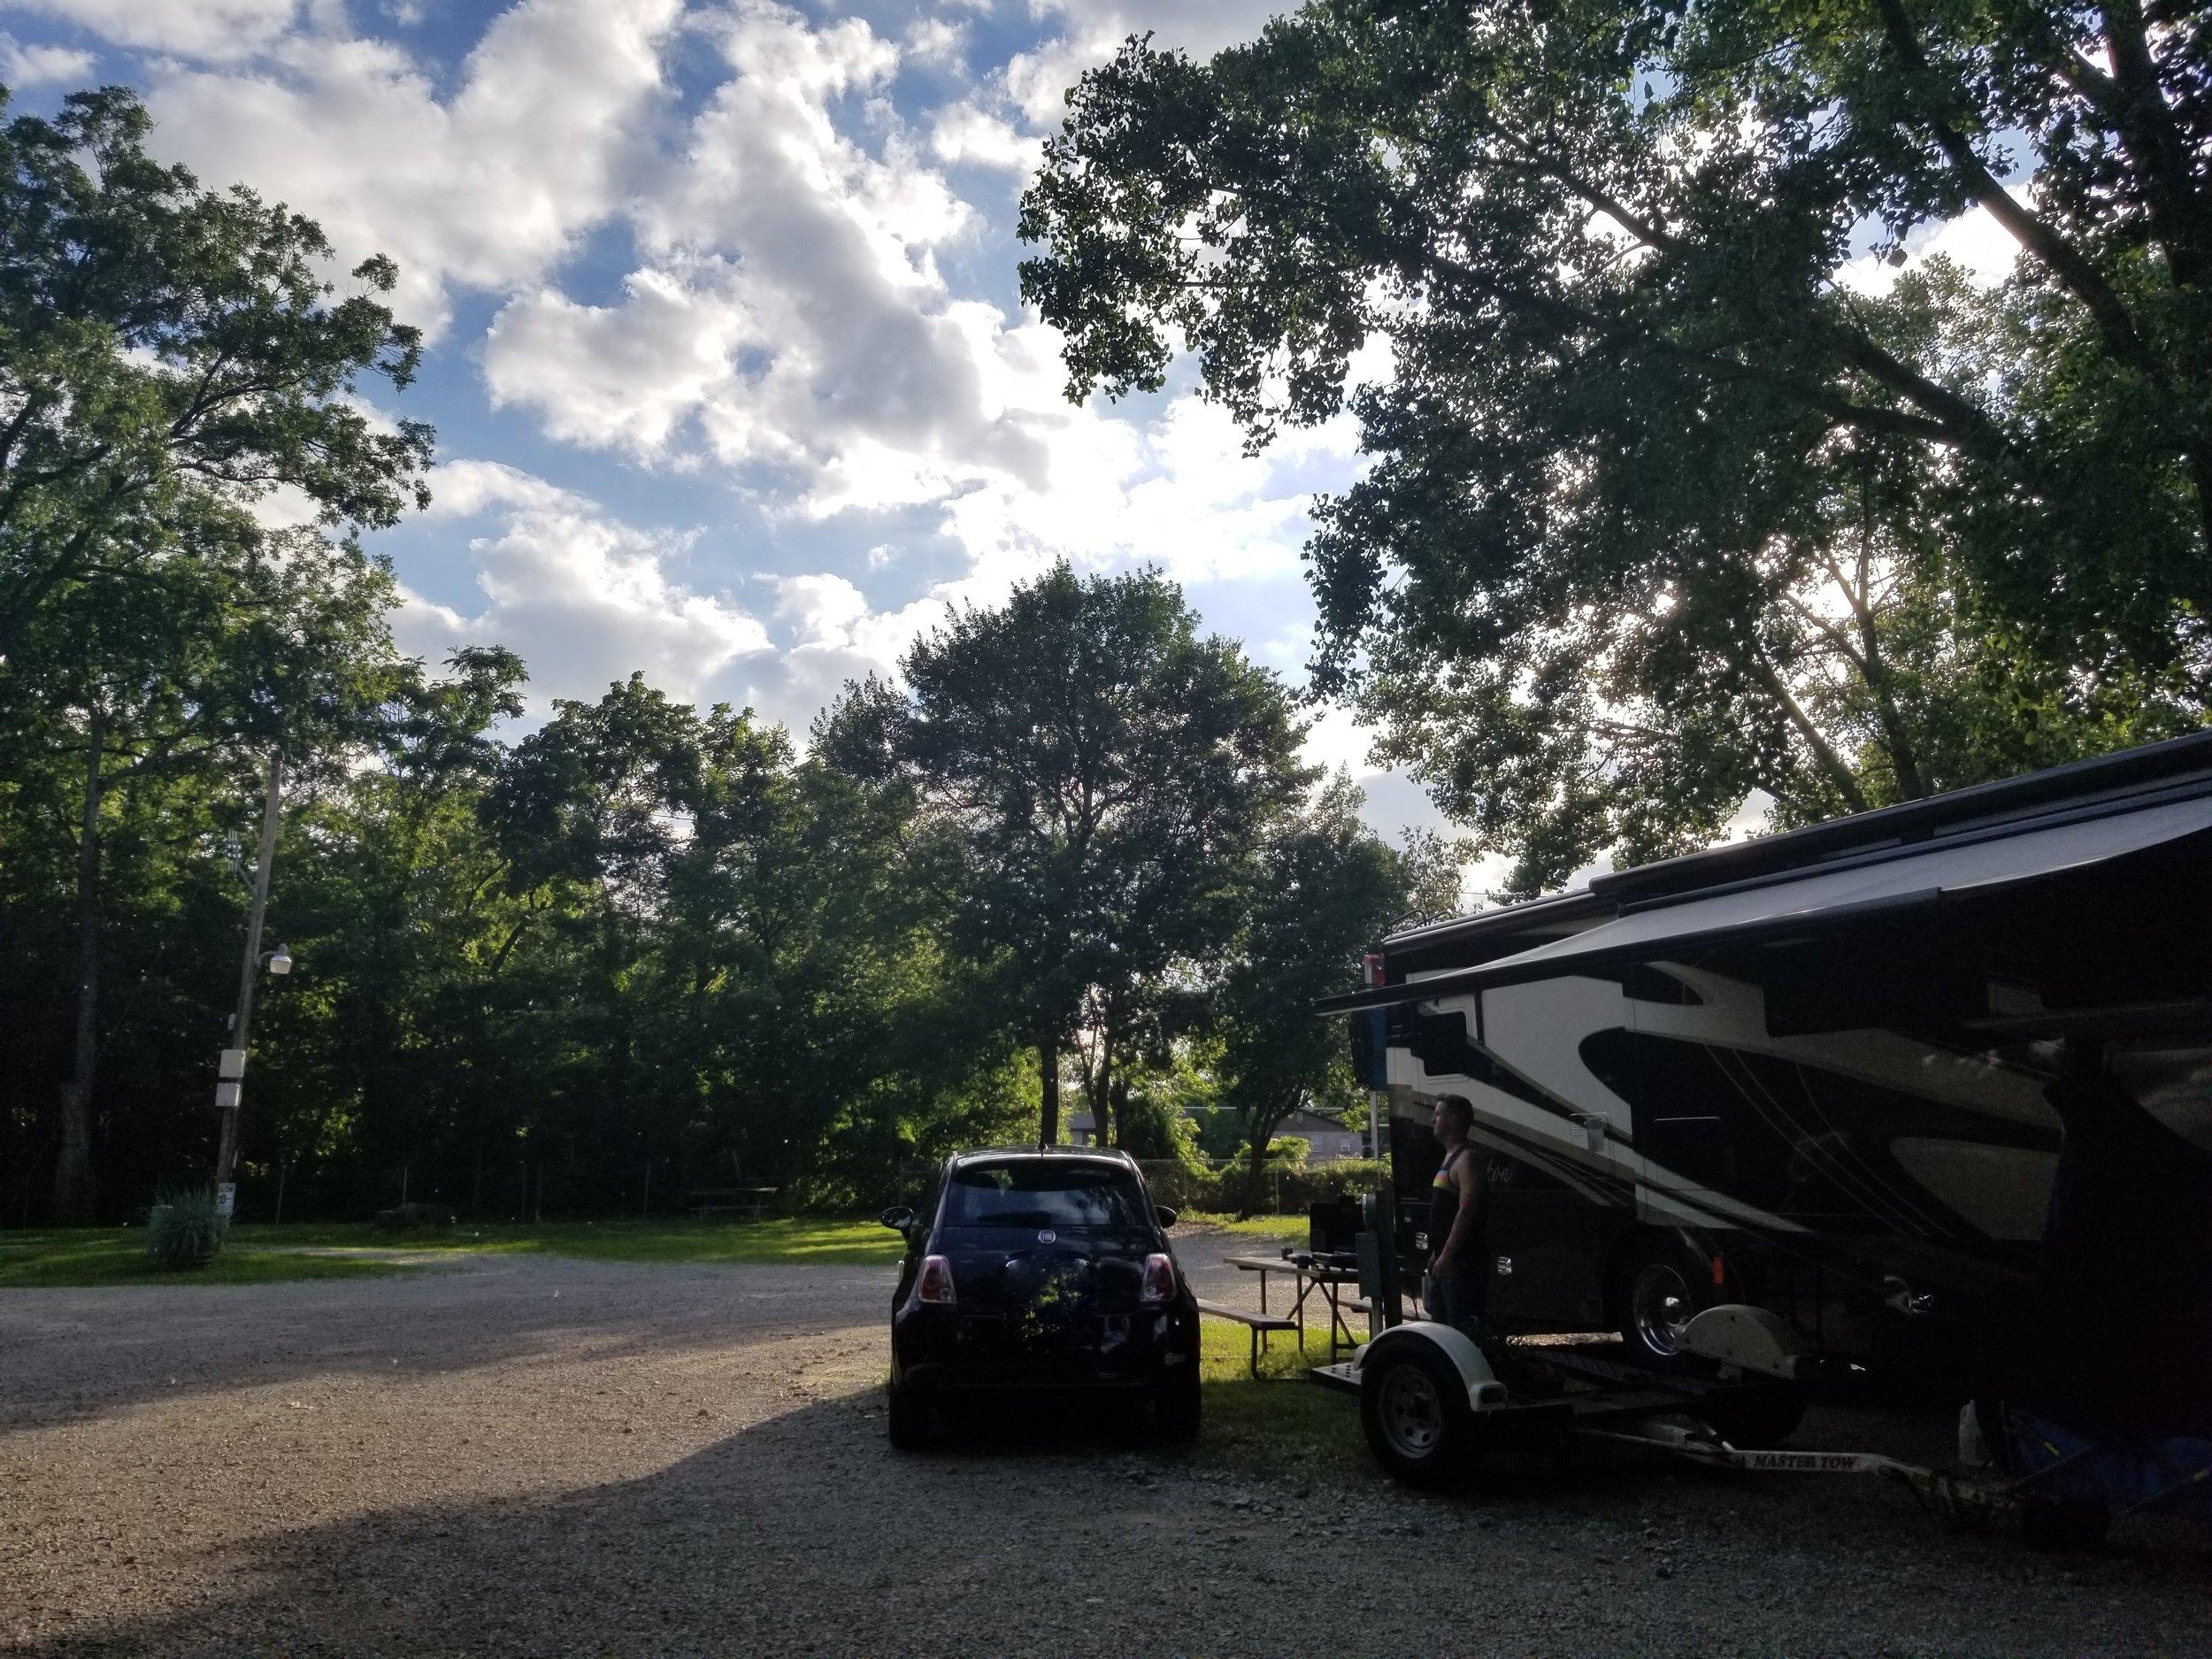 Our spot at Riverside RV Resort & Campground in Bartlesville, OK